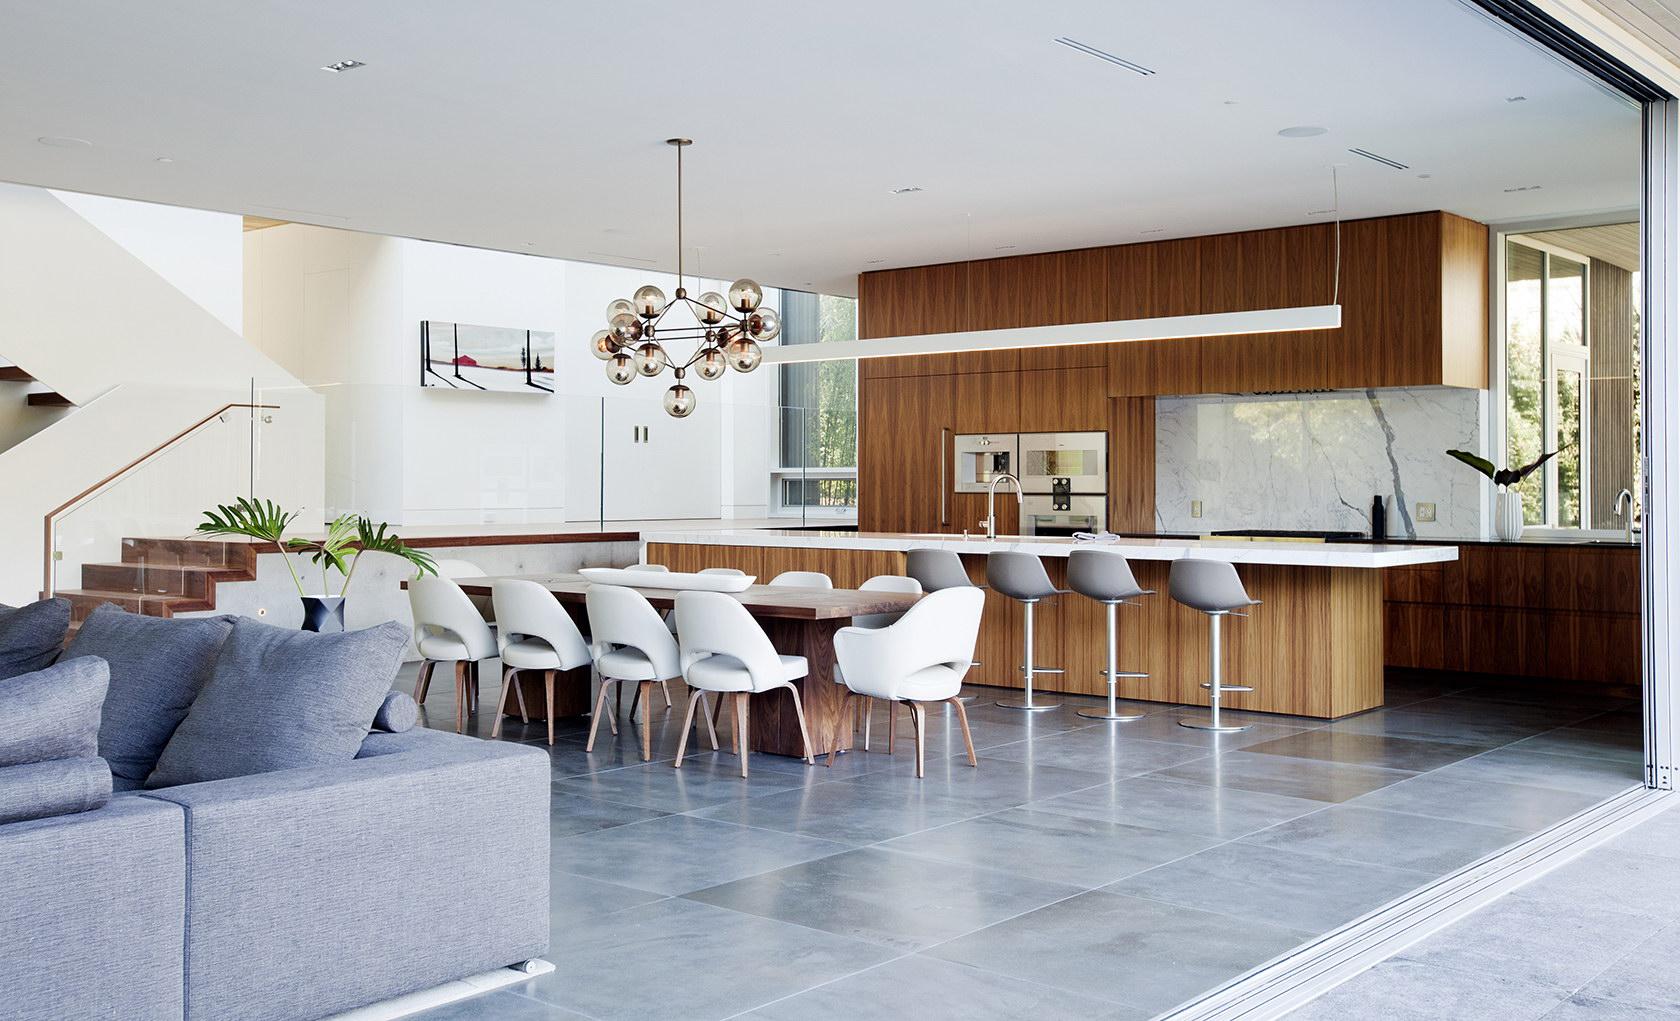 Three-Levels Residence by Evoke